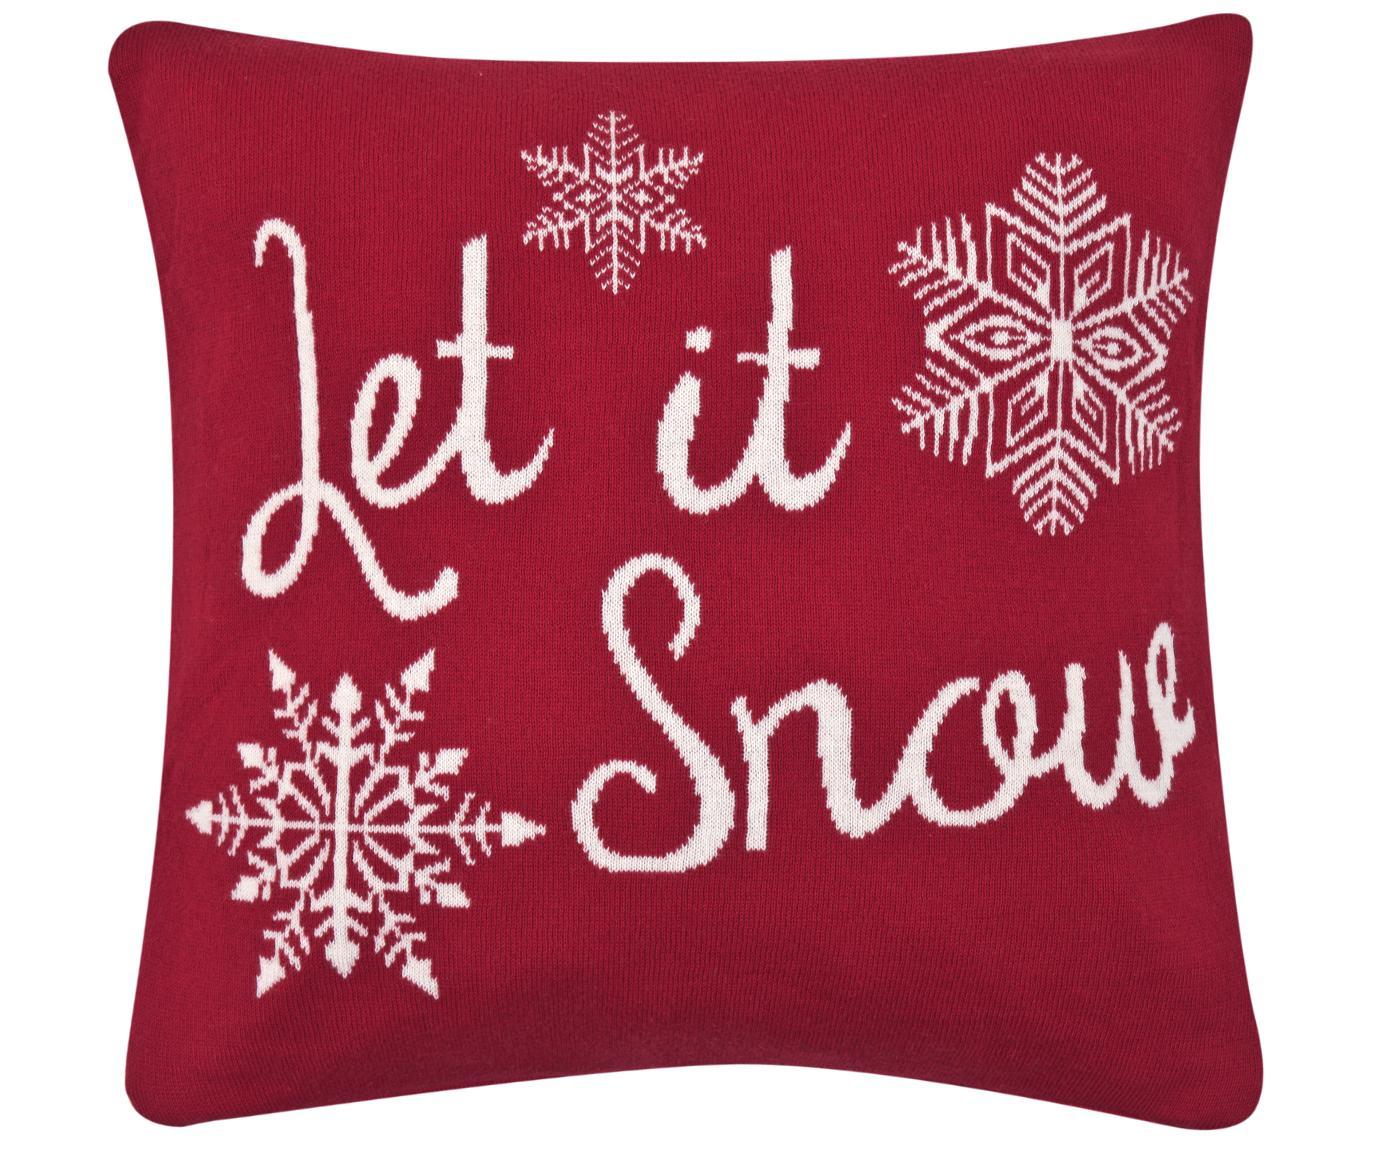 Strick-Kissenhülle Let it Snow in Rot/Weiss mit Schriftzug, Baumwolle, Rot, Cremeweiss, 40 x 40 cm